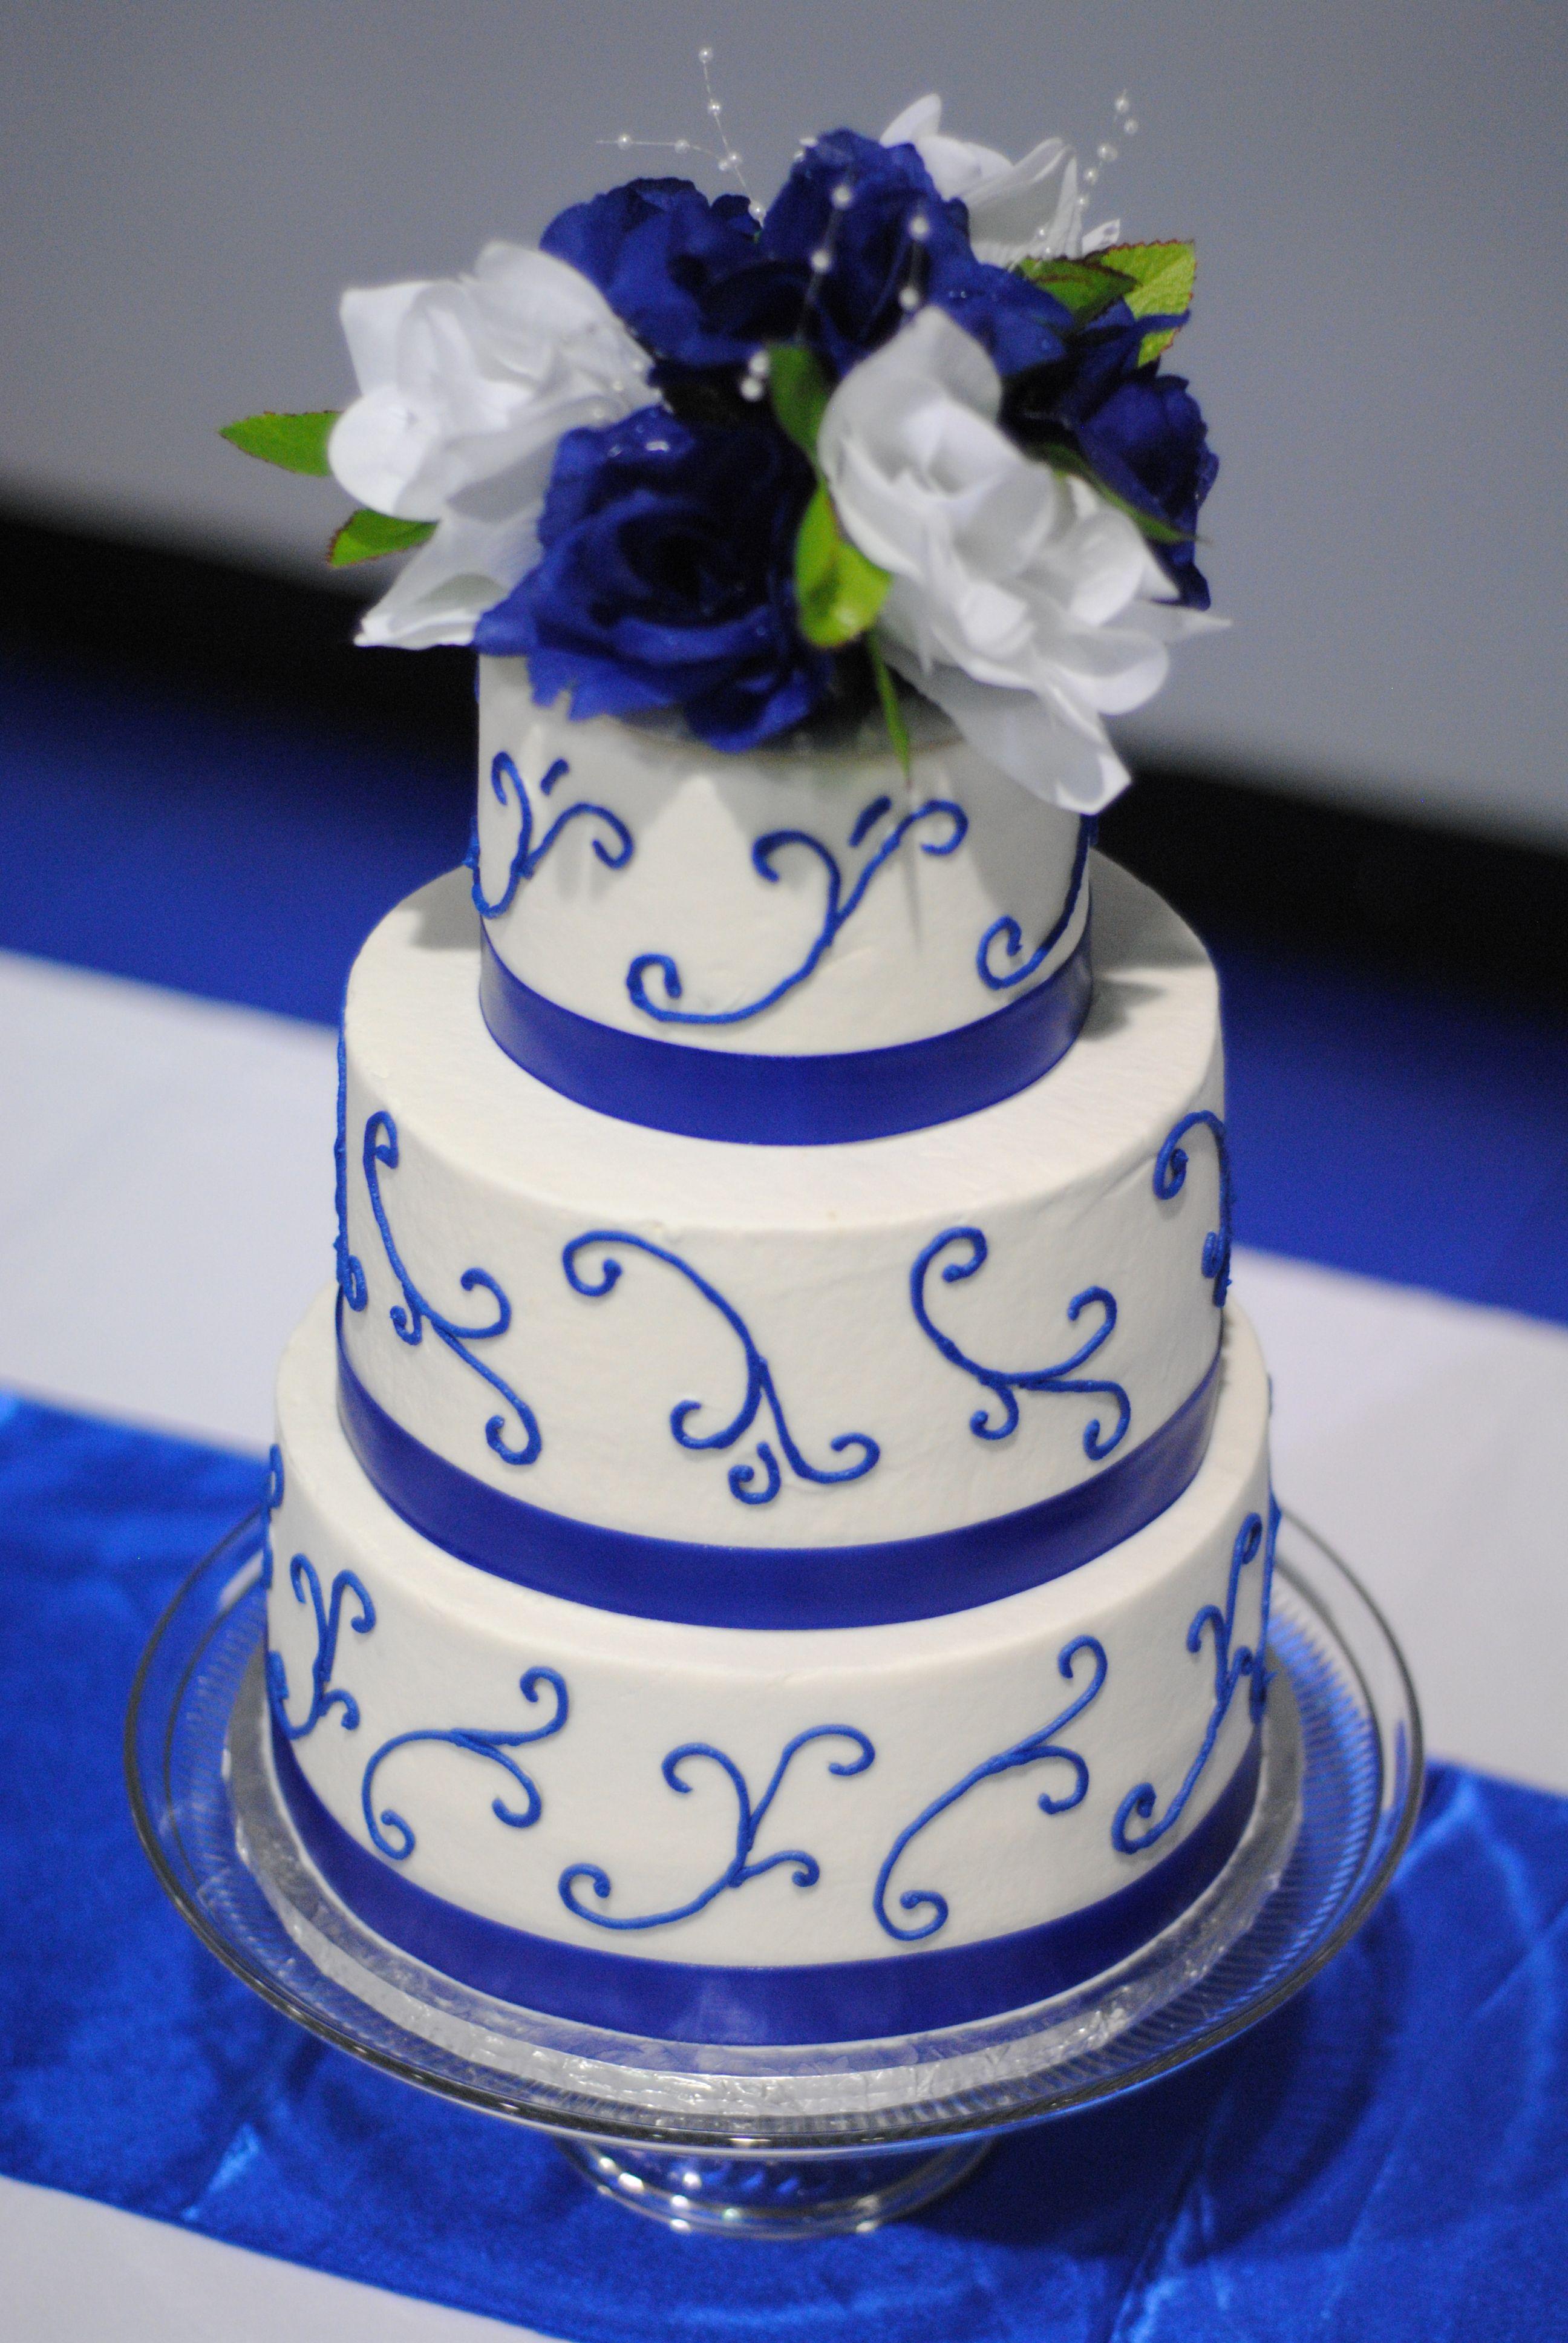 Royal blue and white swirl wedding cake